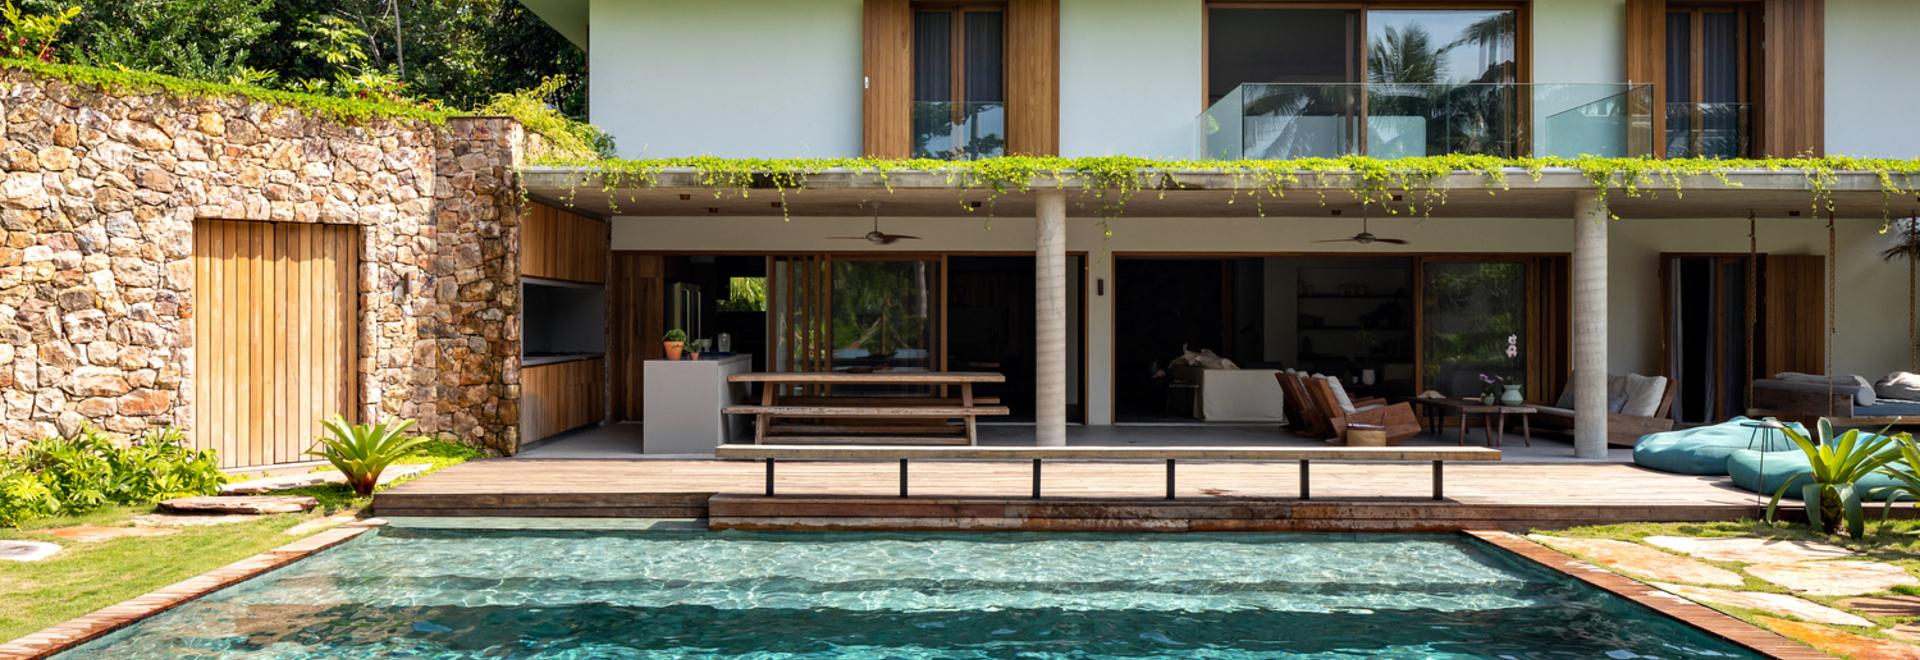 IP 01 House / Studio Gabriel Garbin Arquitetura